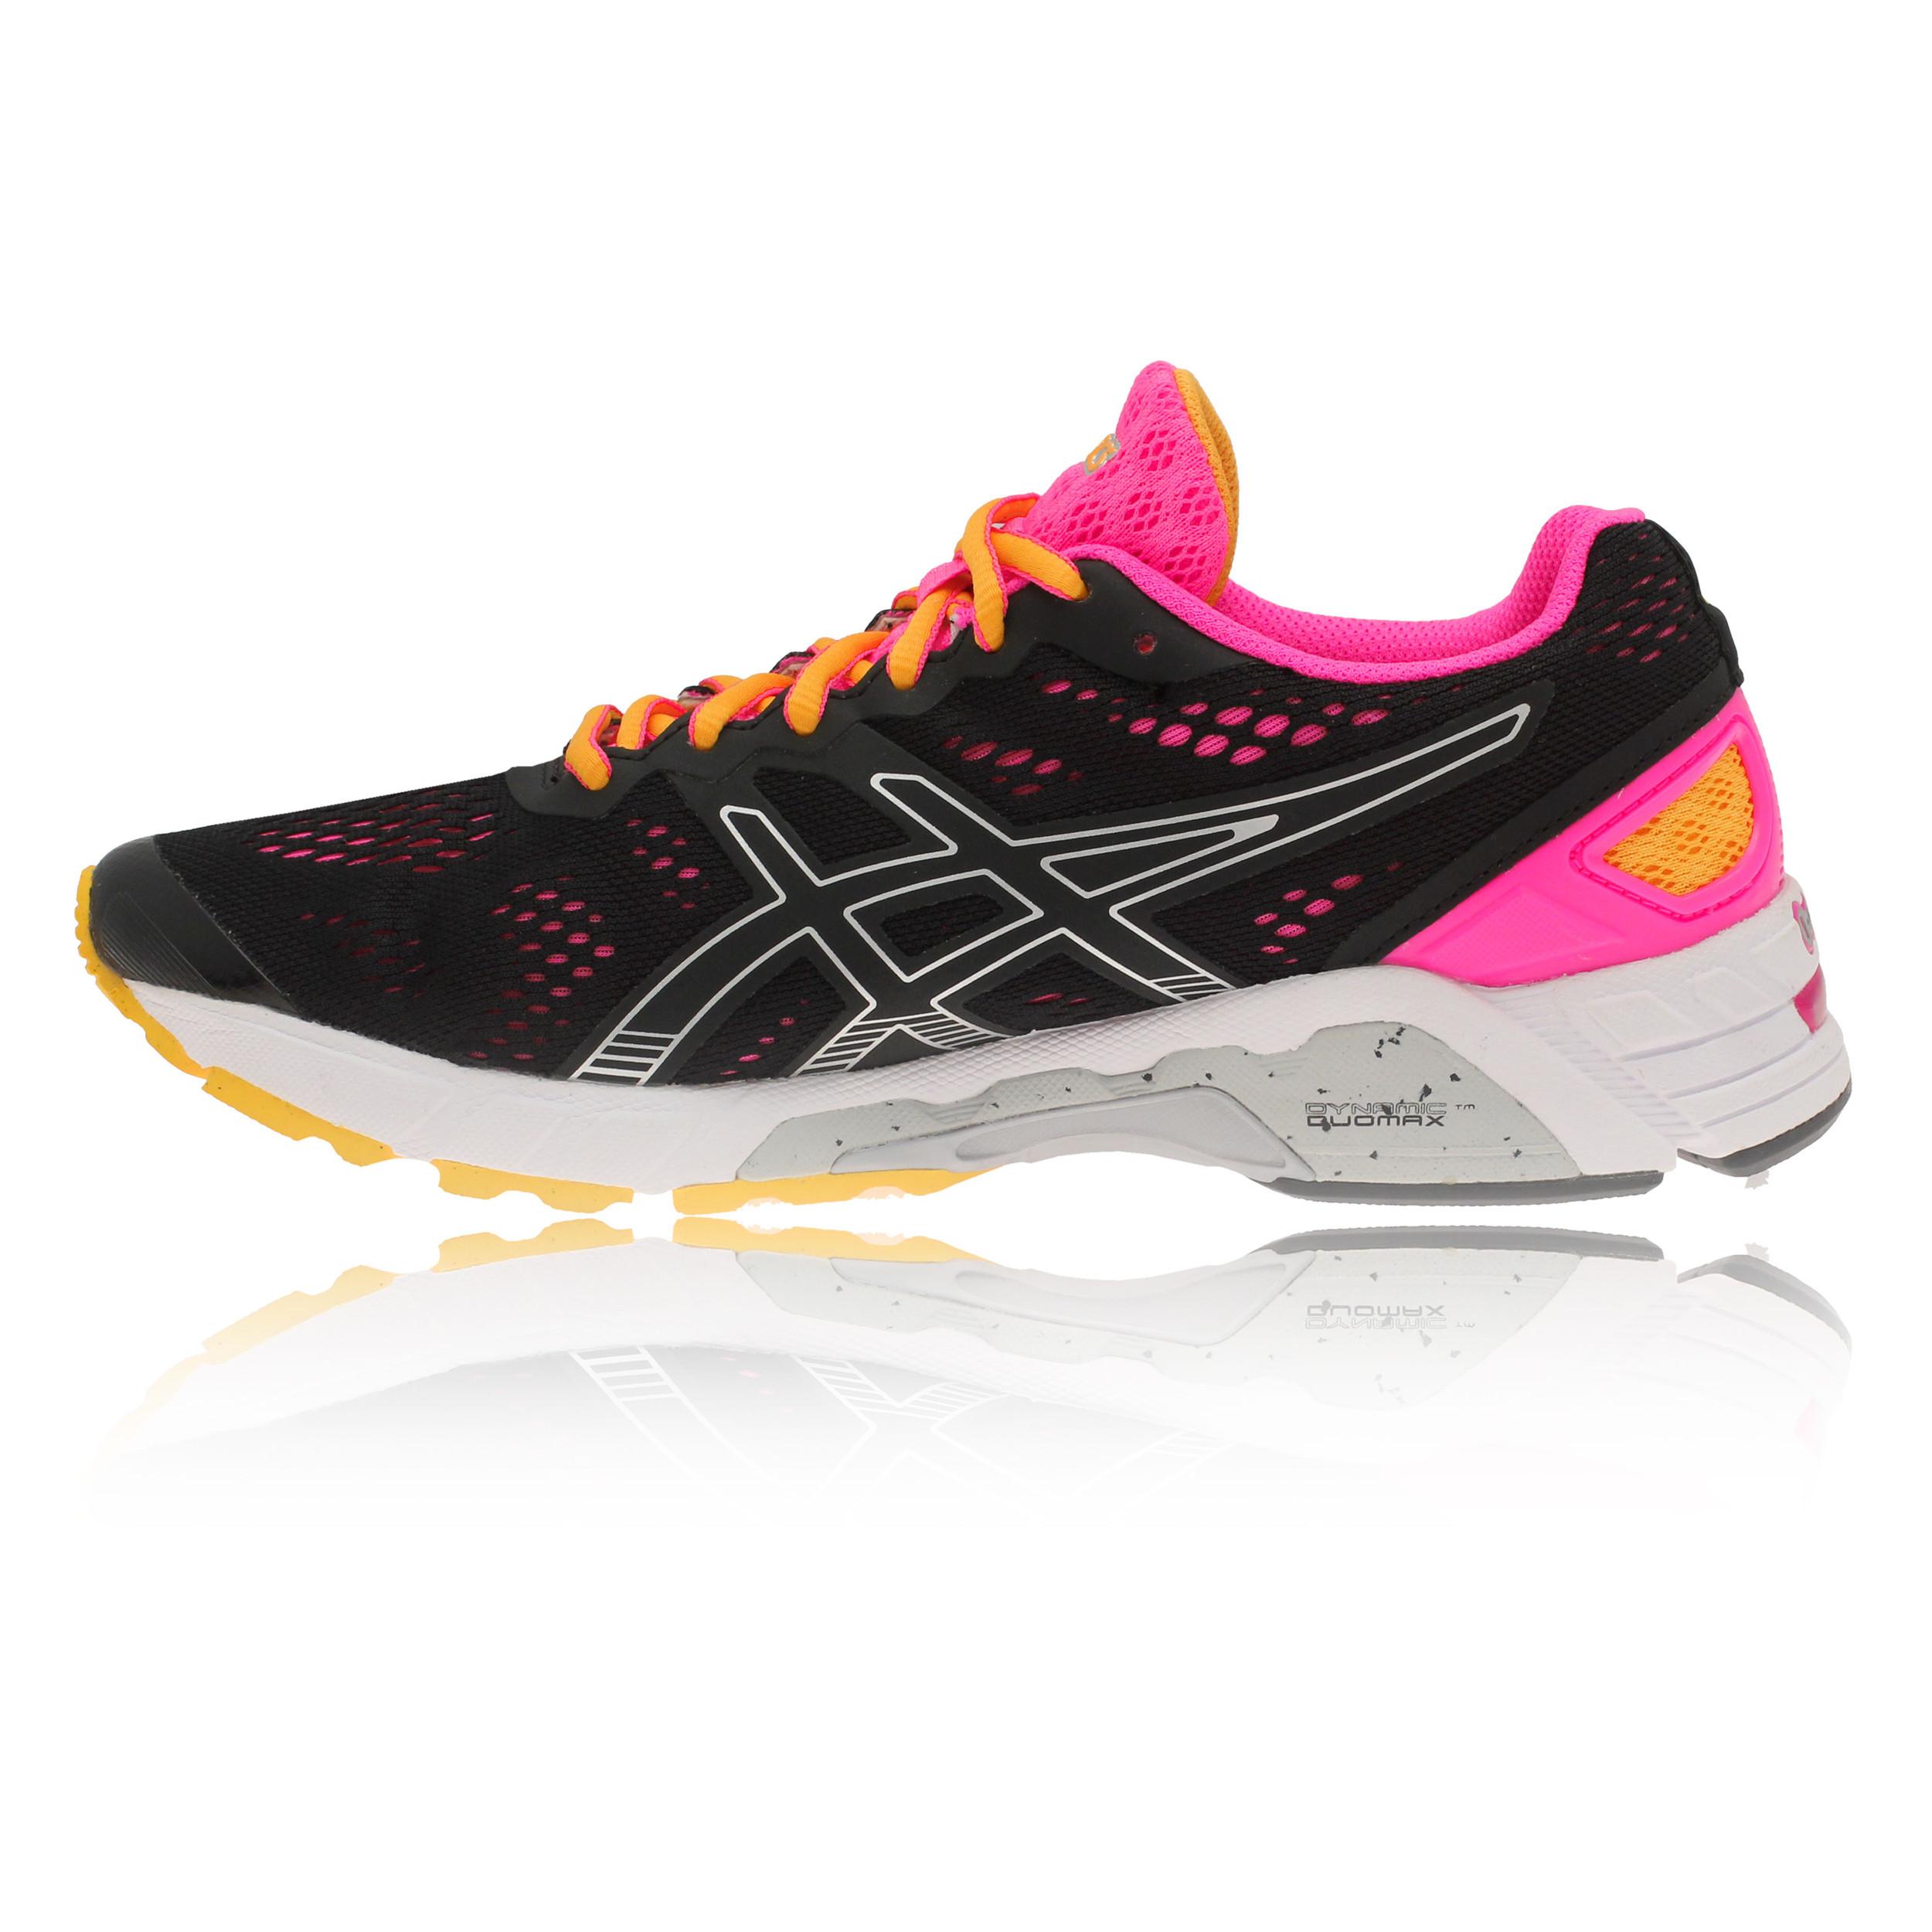 Asics Gel Trainer 19 zapatos